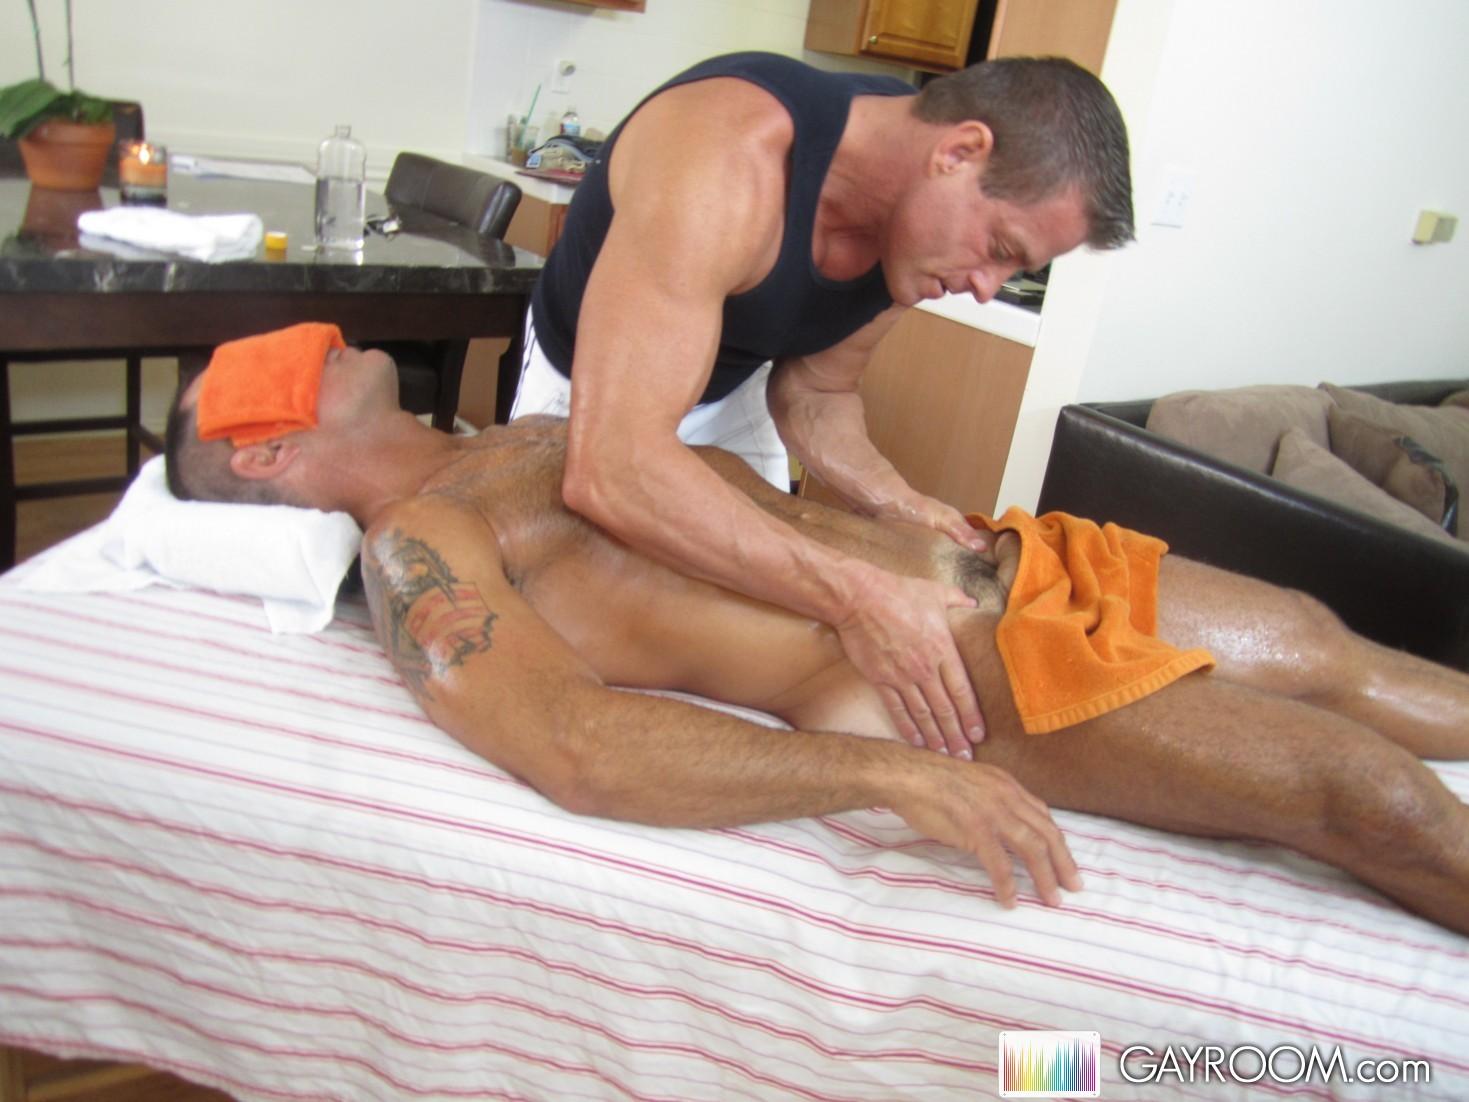 bend over gay ass tumblr